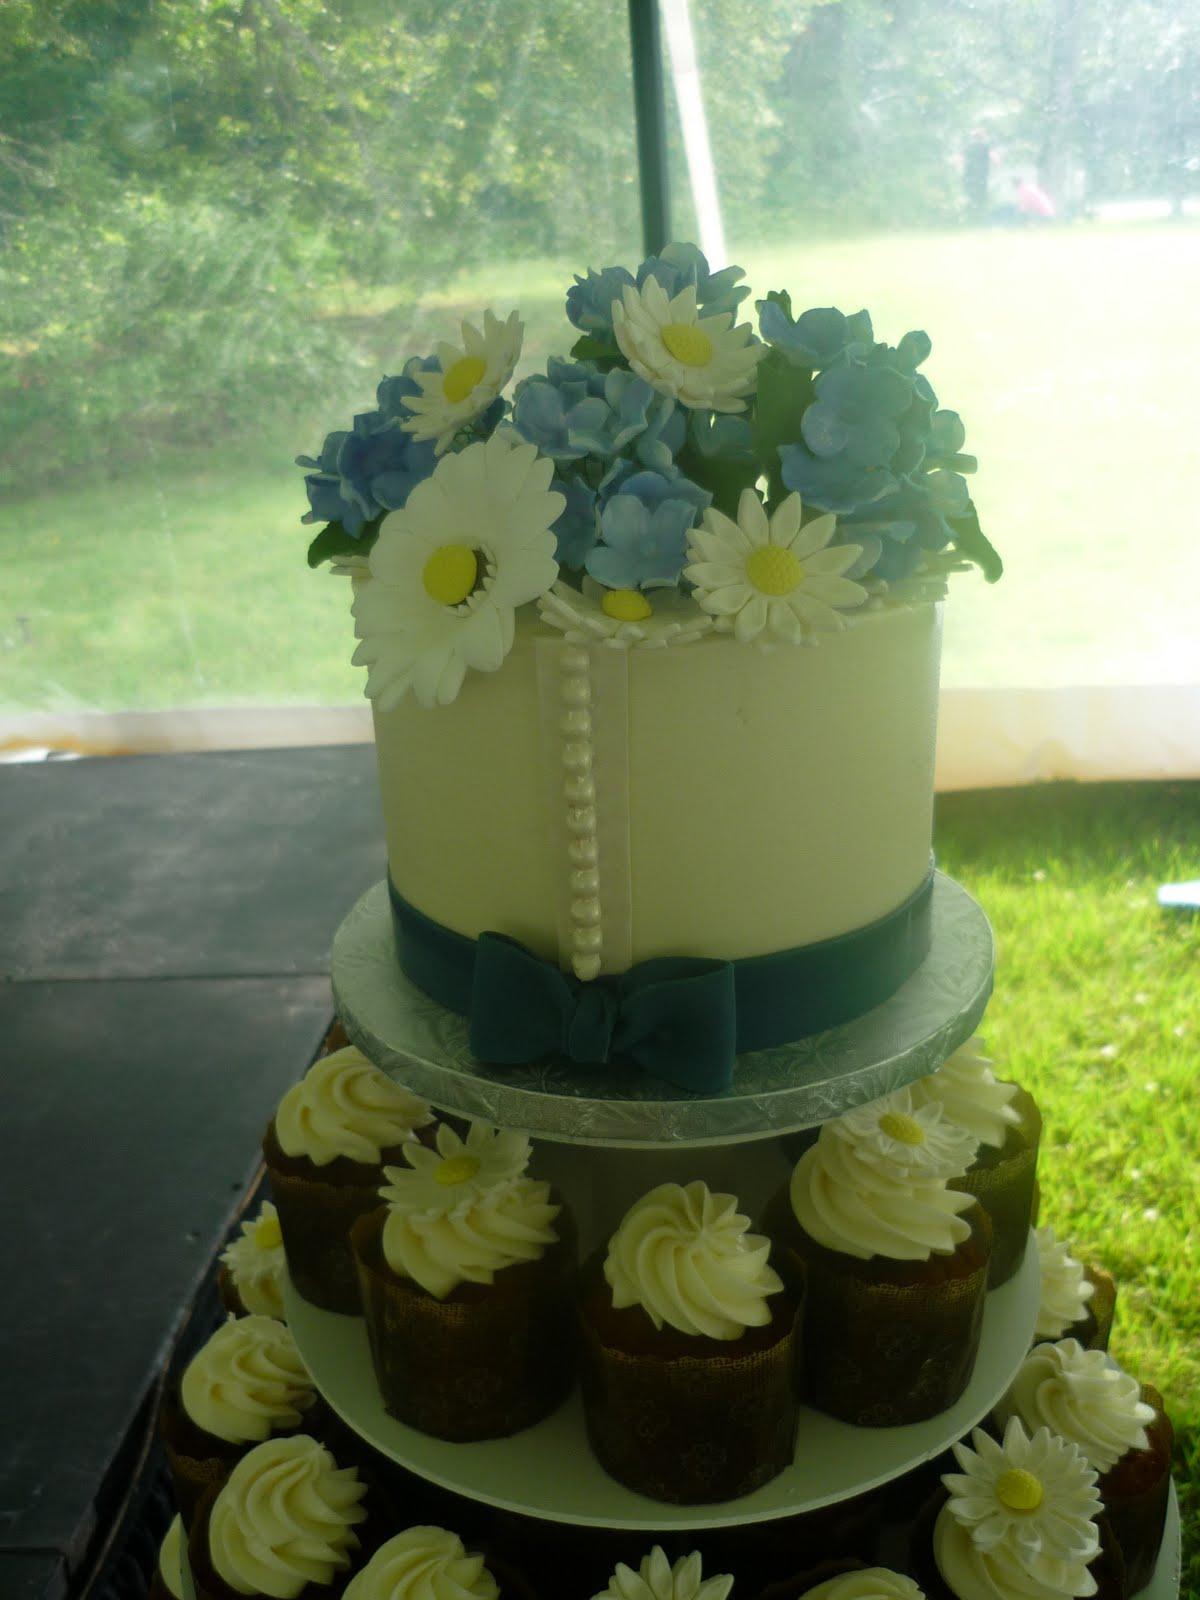 Artisan Bake Shop Hydrangea Daisy with Wedding Dress Detail - 2014